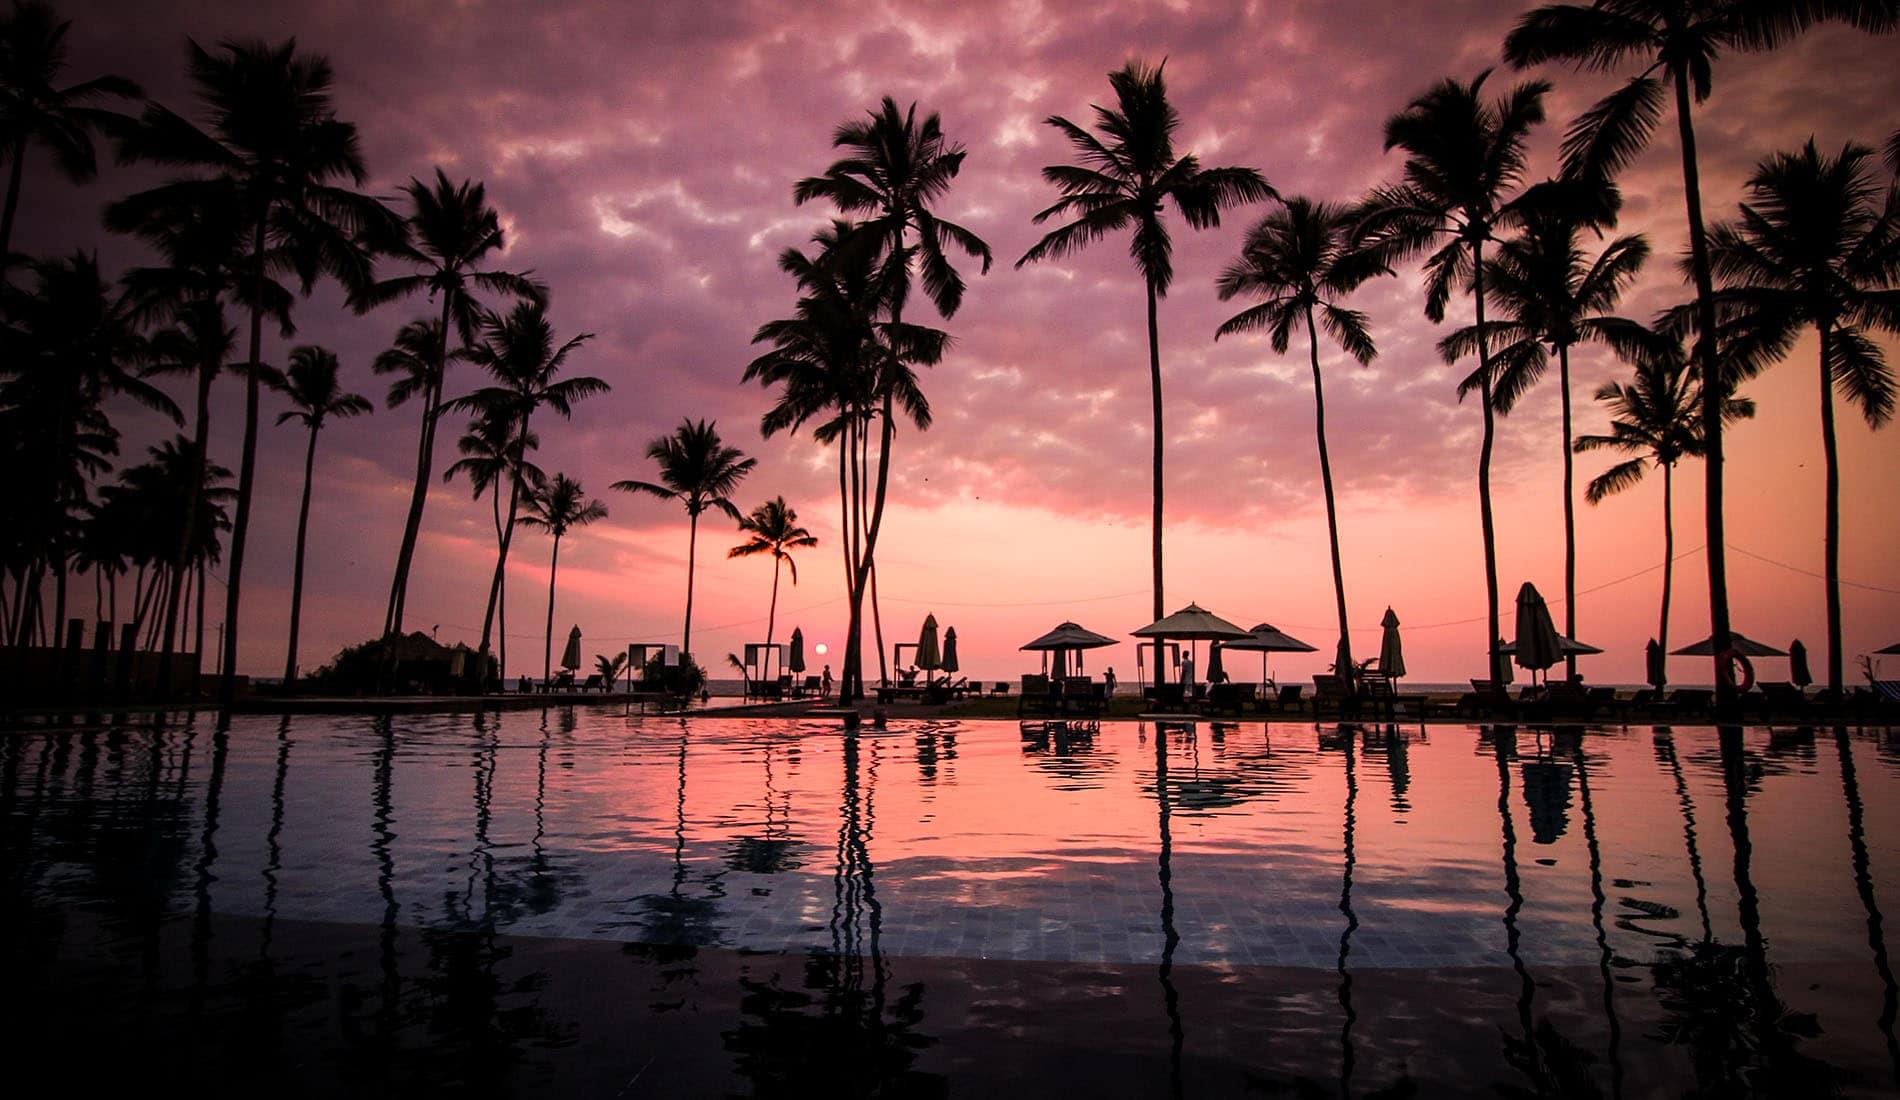 Suriya Sunset